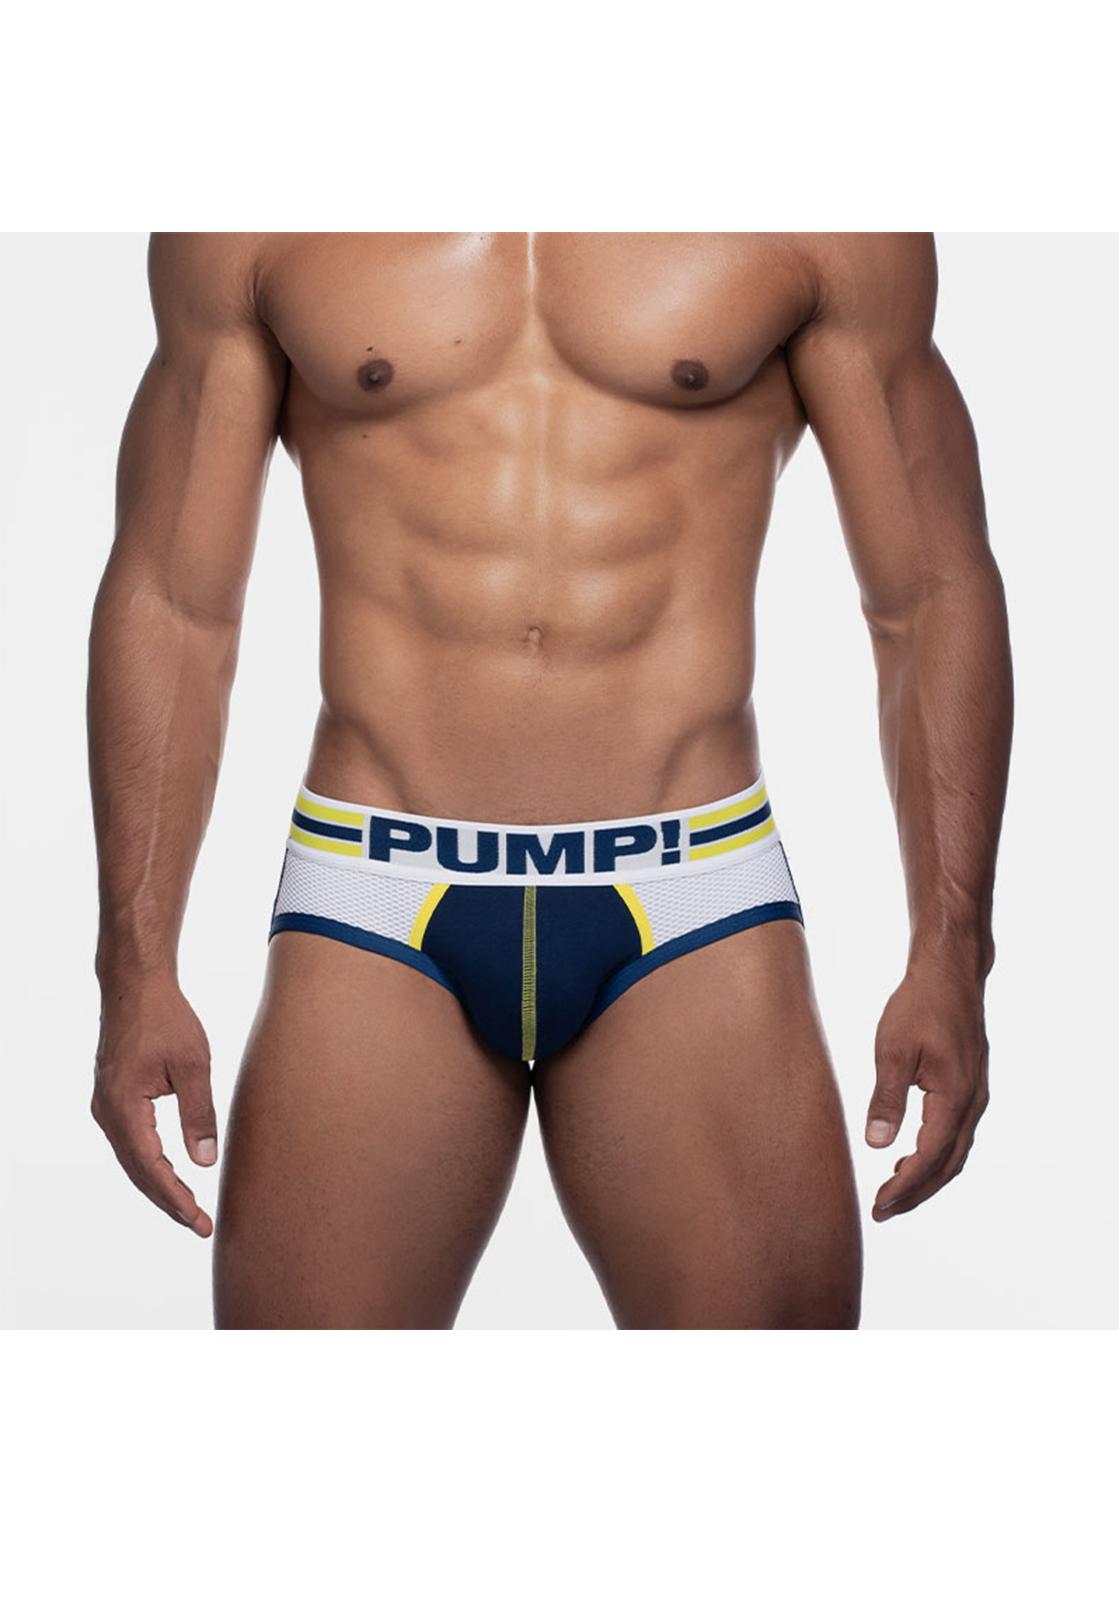 PUMP! Recharge Sportboy Jock | Navy/White/Yellow